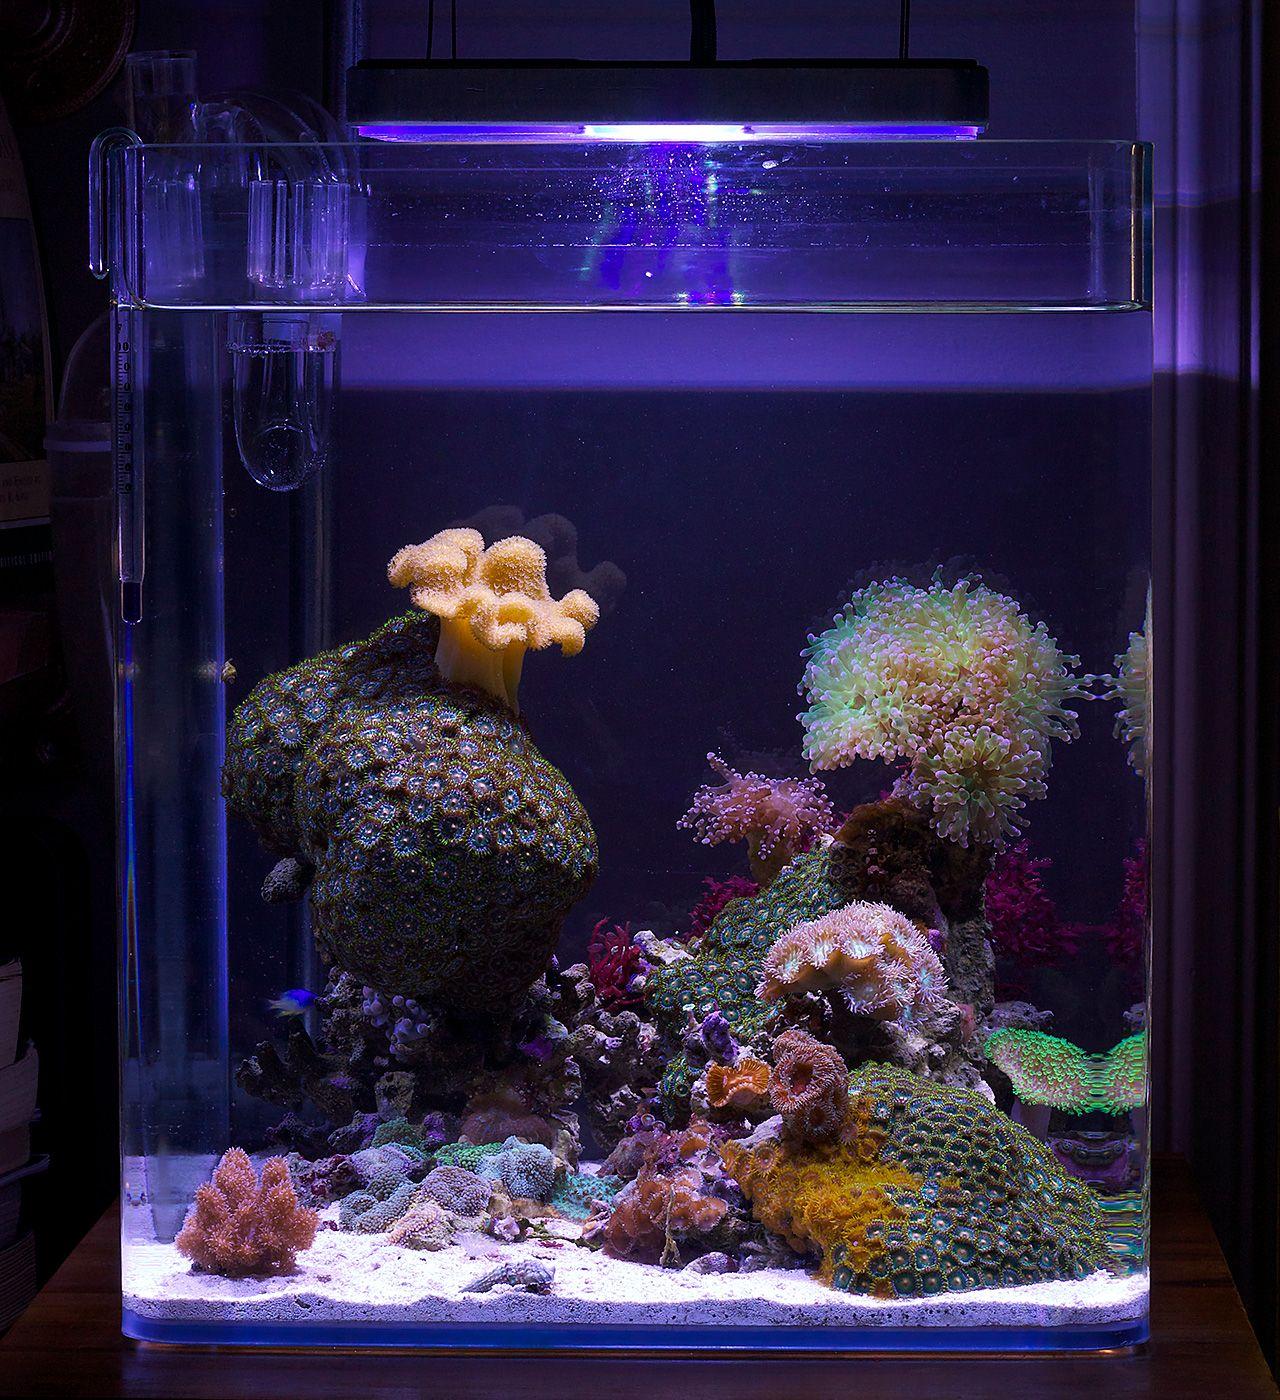 Justind823 2014 Featured Nano Reefs Featured Aquariums Monthly Featured Nano Reef Aquarium Profiles Reef Aquarium Coral Reef Aquarium Aquarium